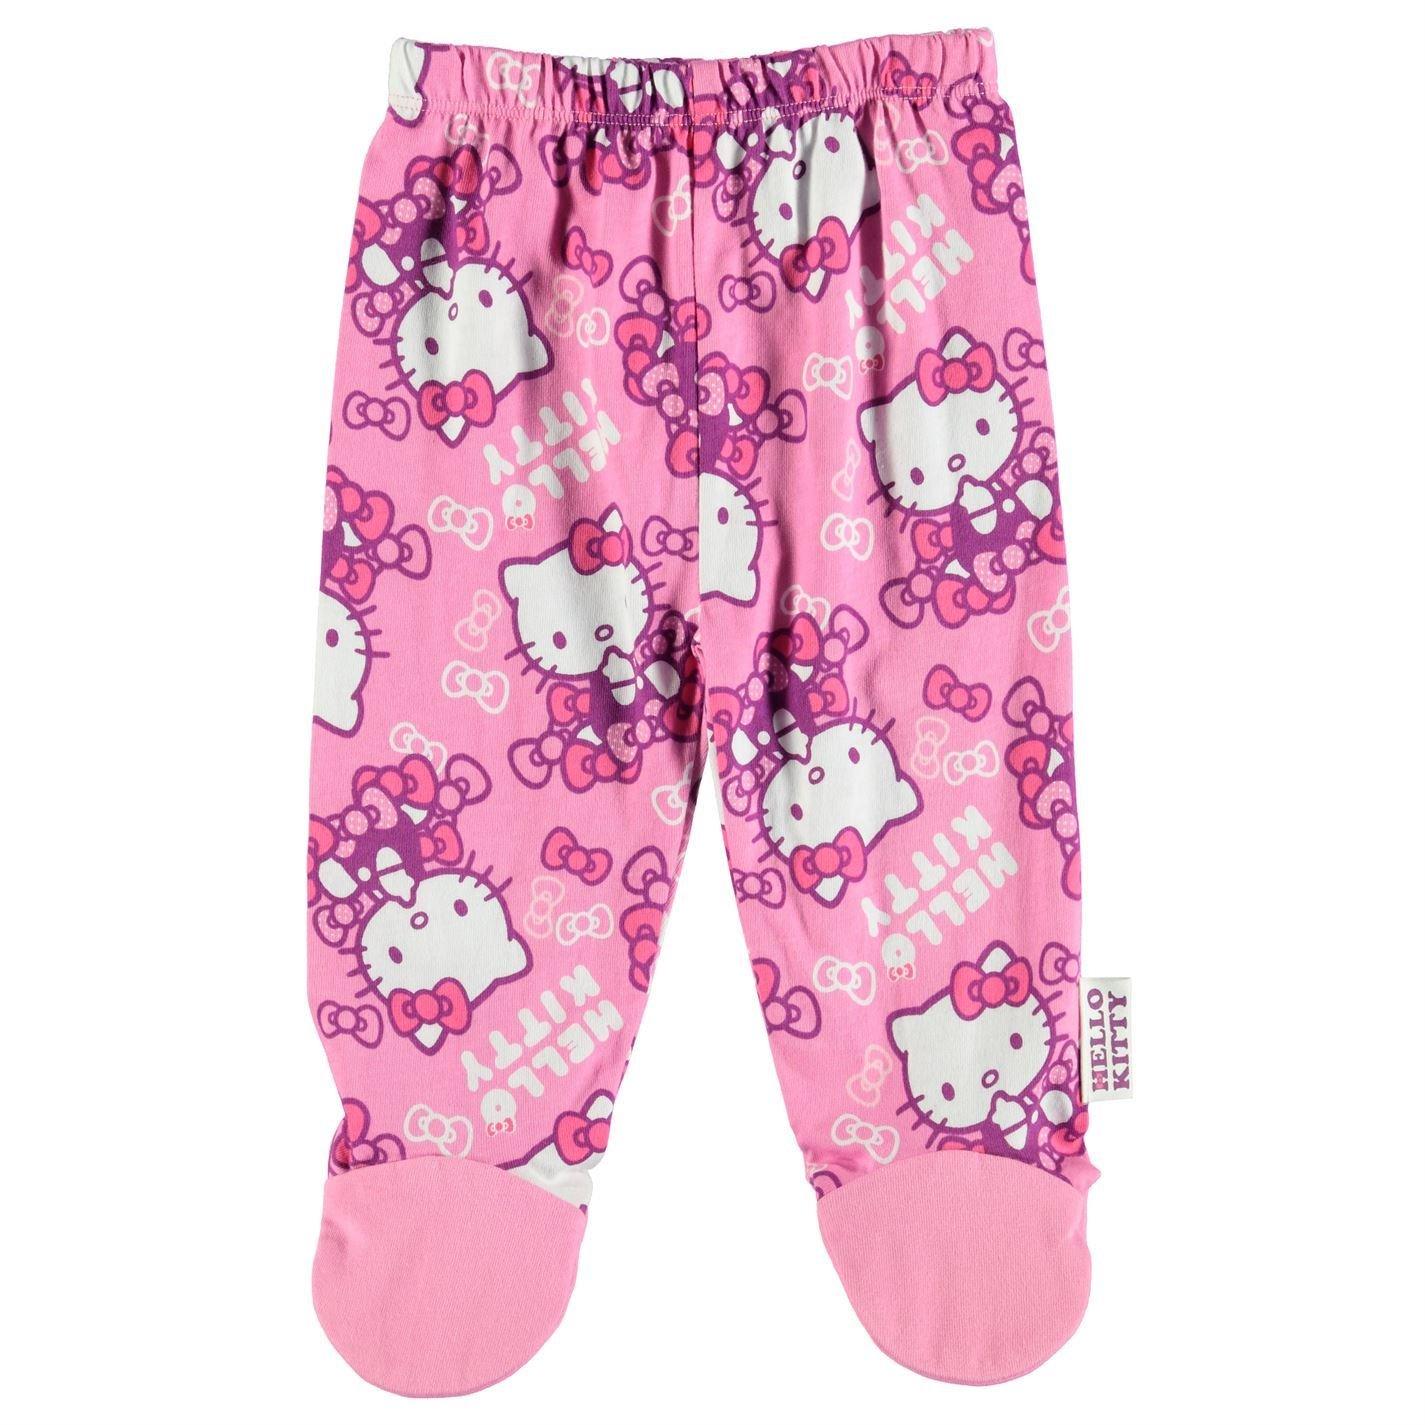 81db6d76e ... 18-24 Meses: Amazon.es: Ropa y accesorios. Hello Kitty - Pijamas enteros  - para bebé niña rosa rosa: Amazon.es: